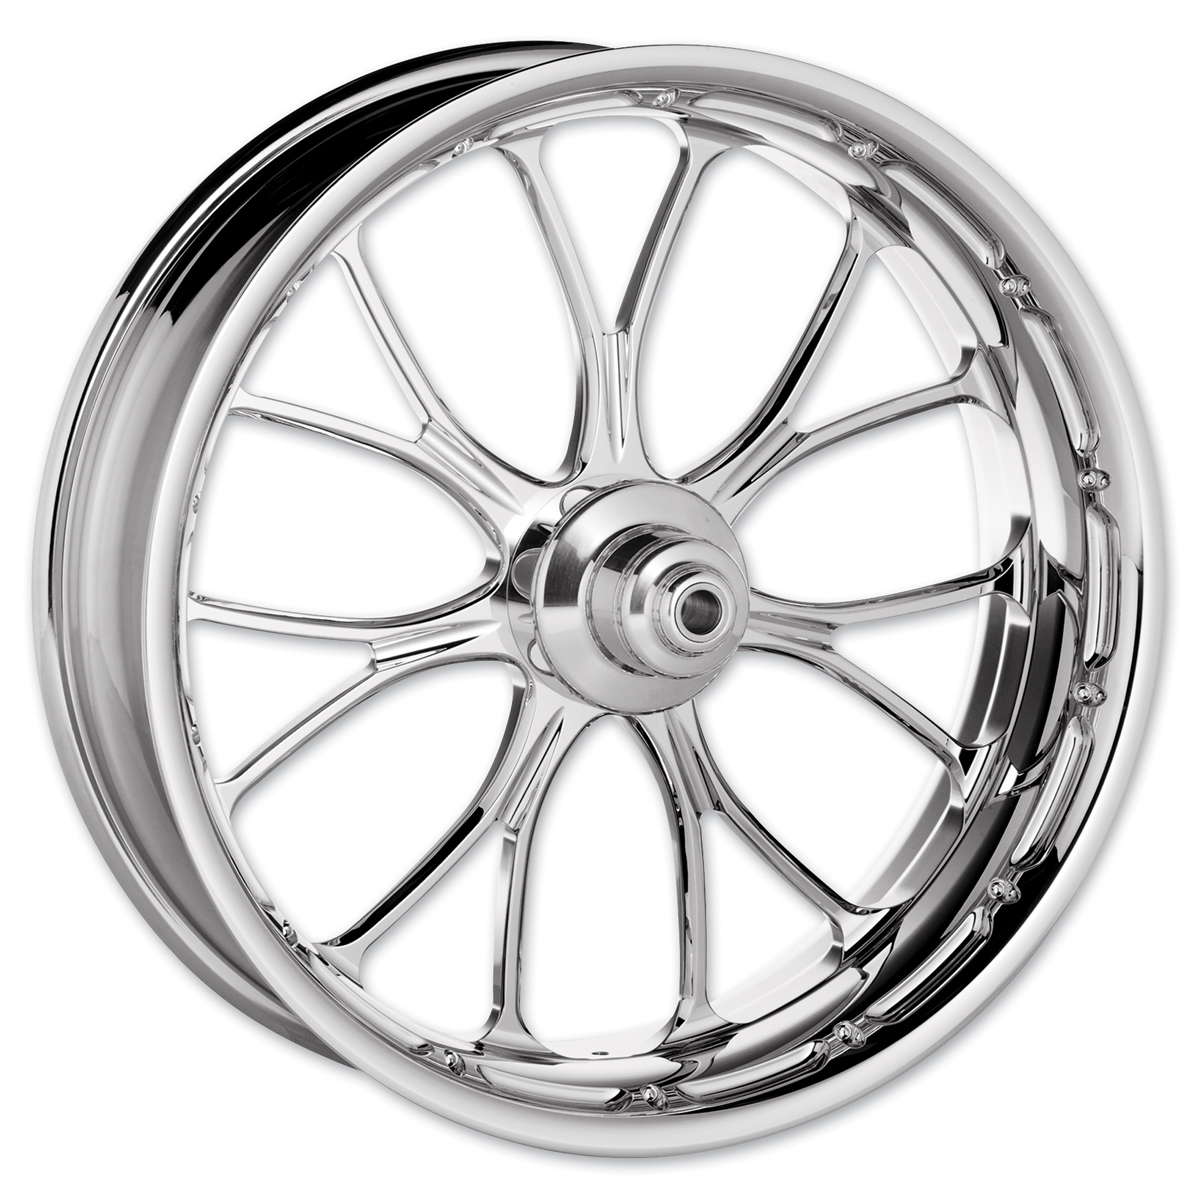 Performance Machine Heathen Chrome Front Wheel 21x3.5 Dual disc